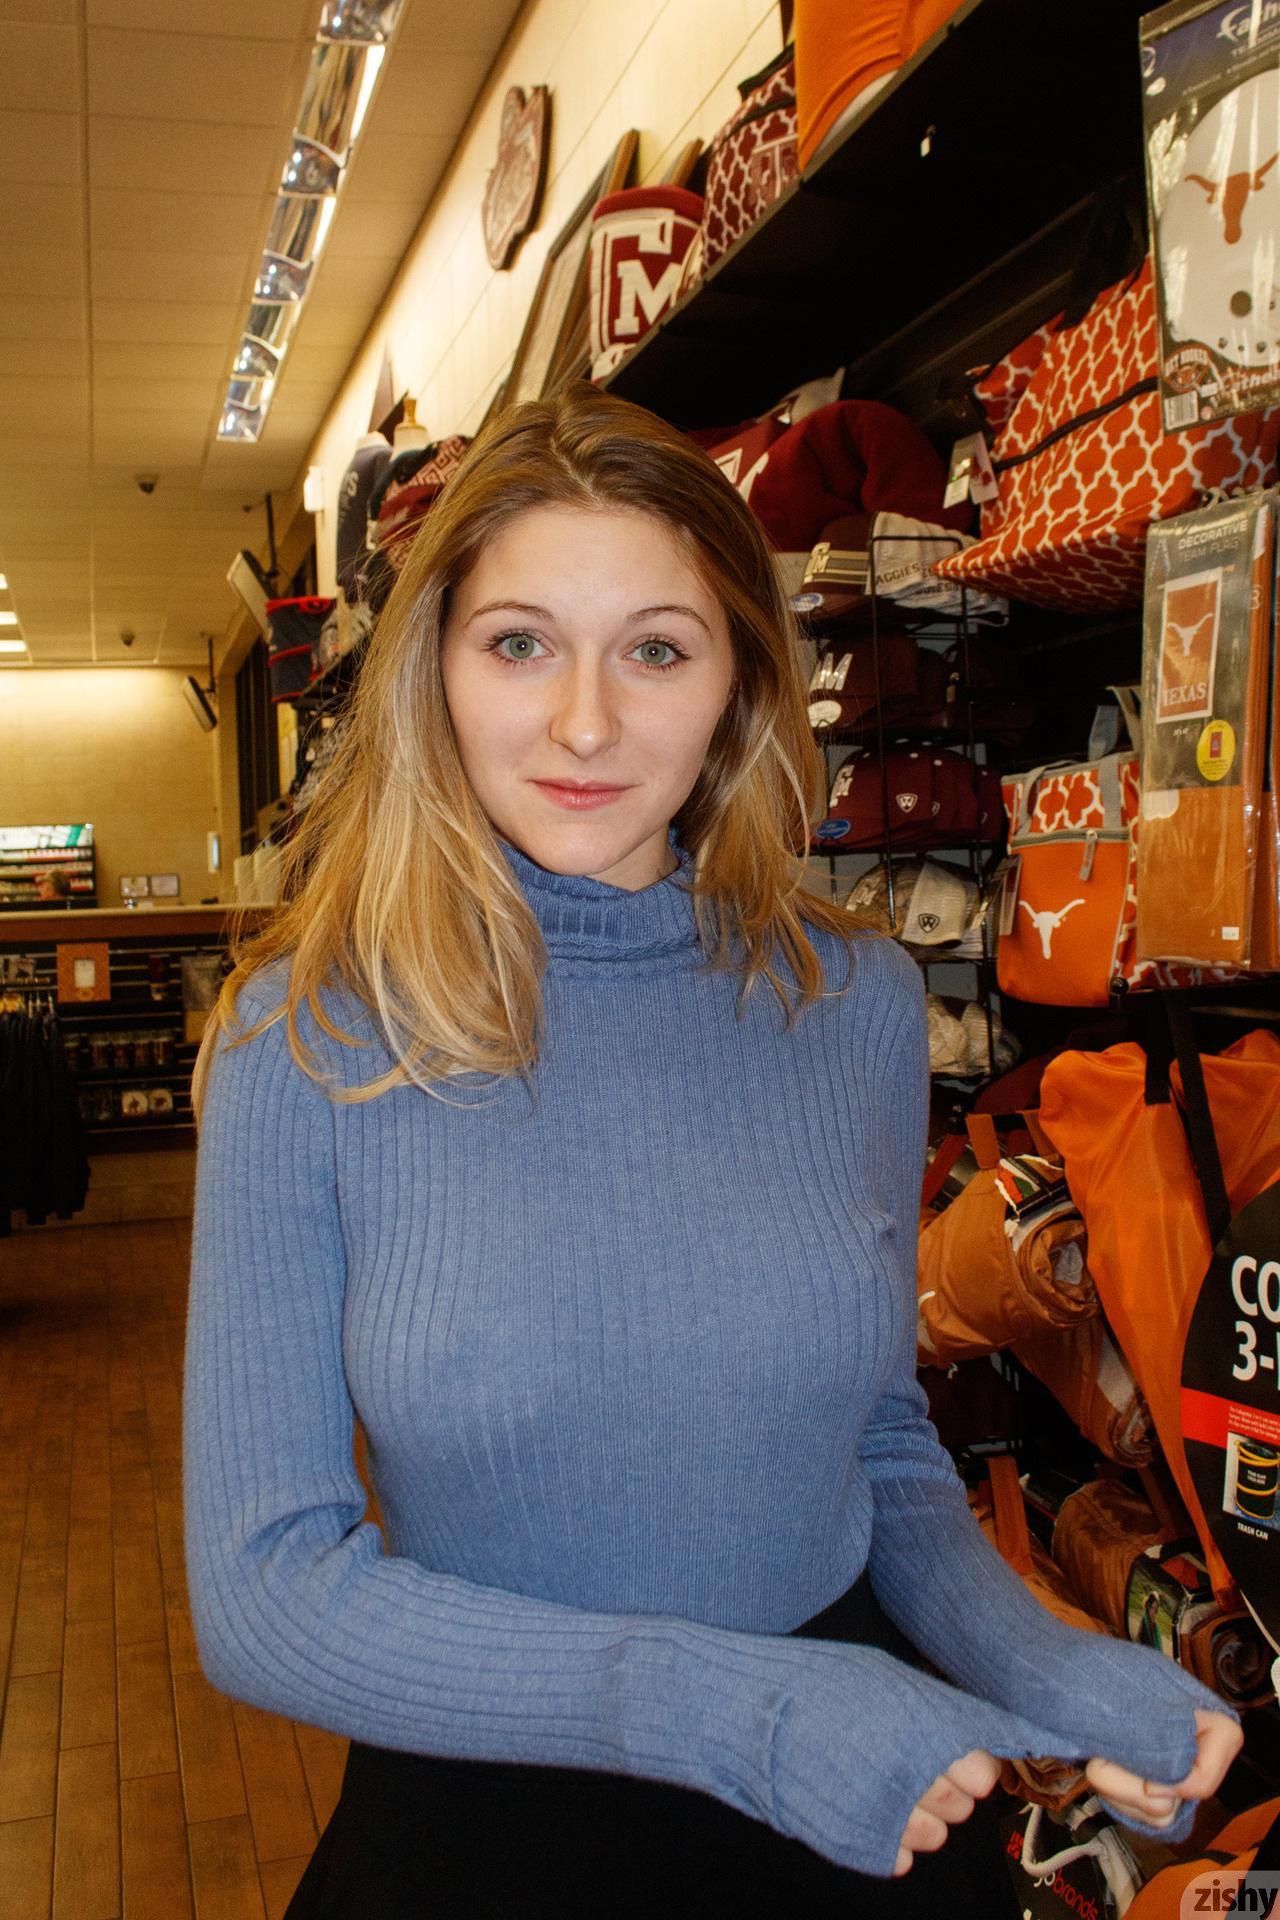 Katie Darling Whats Buc Ees Zishy (31)